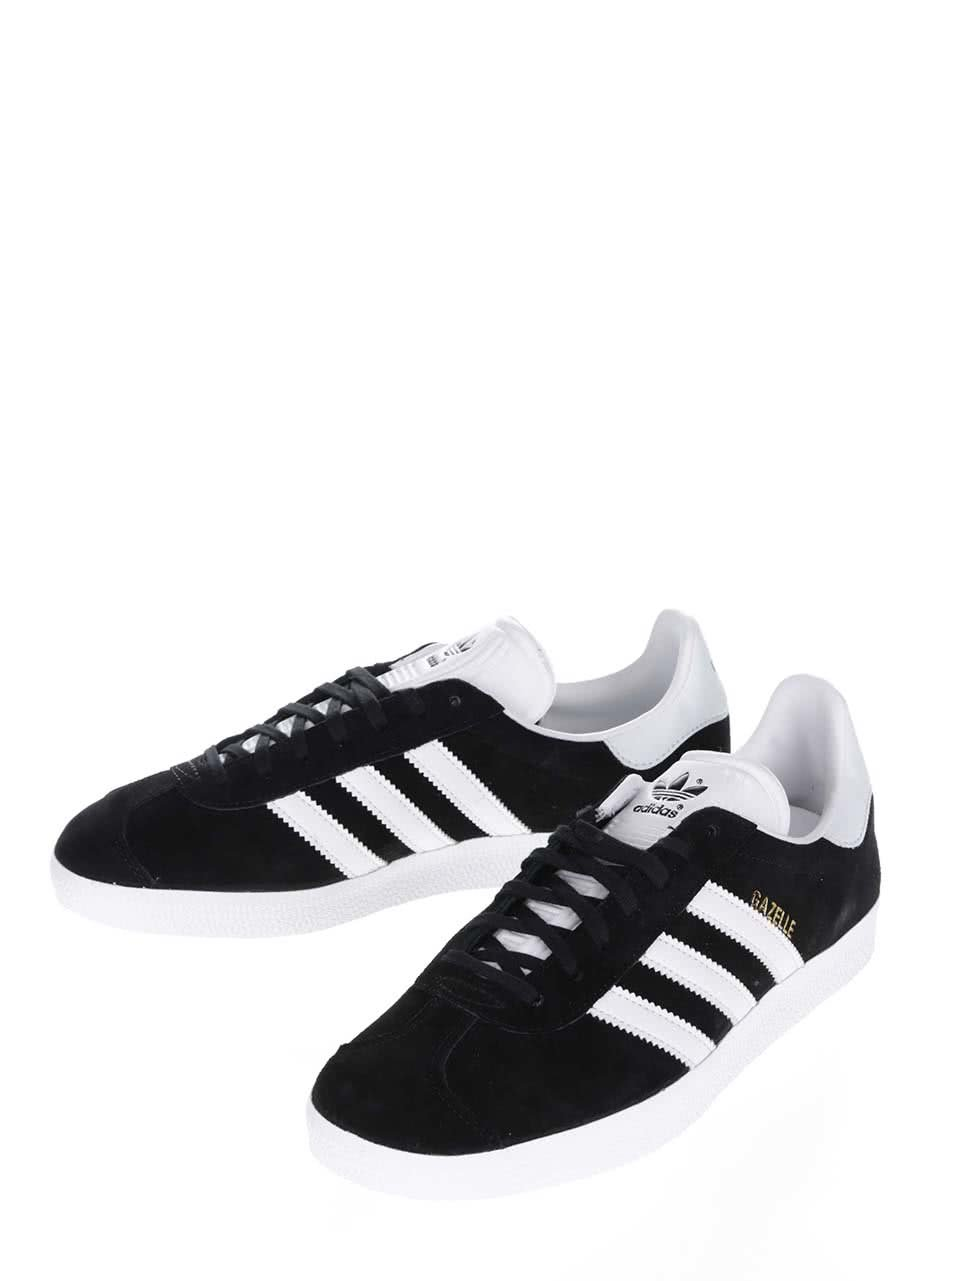 19e365956f Černé pánské semišové tenisky adidas Originals Gazelle ...